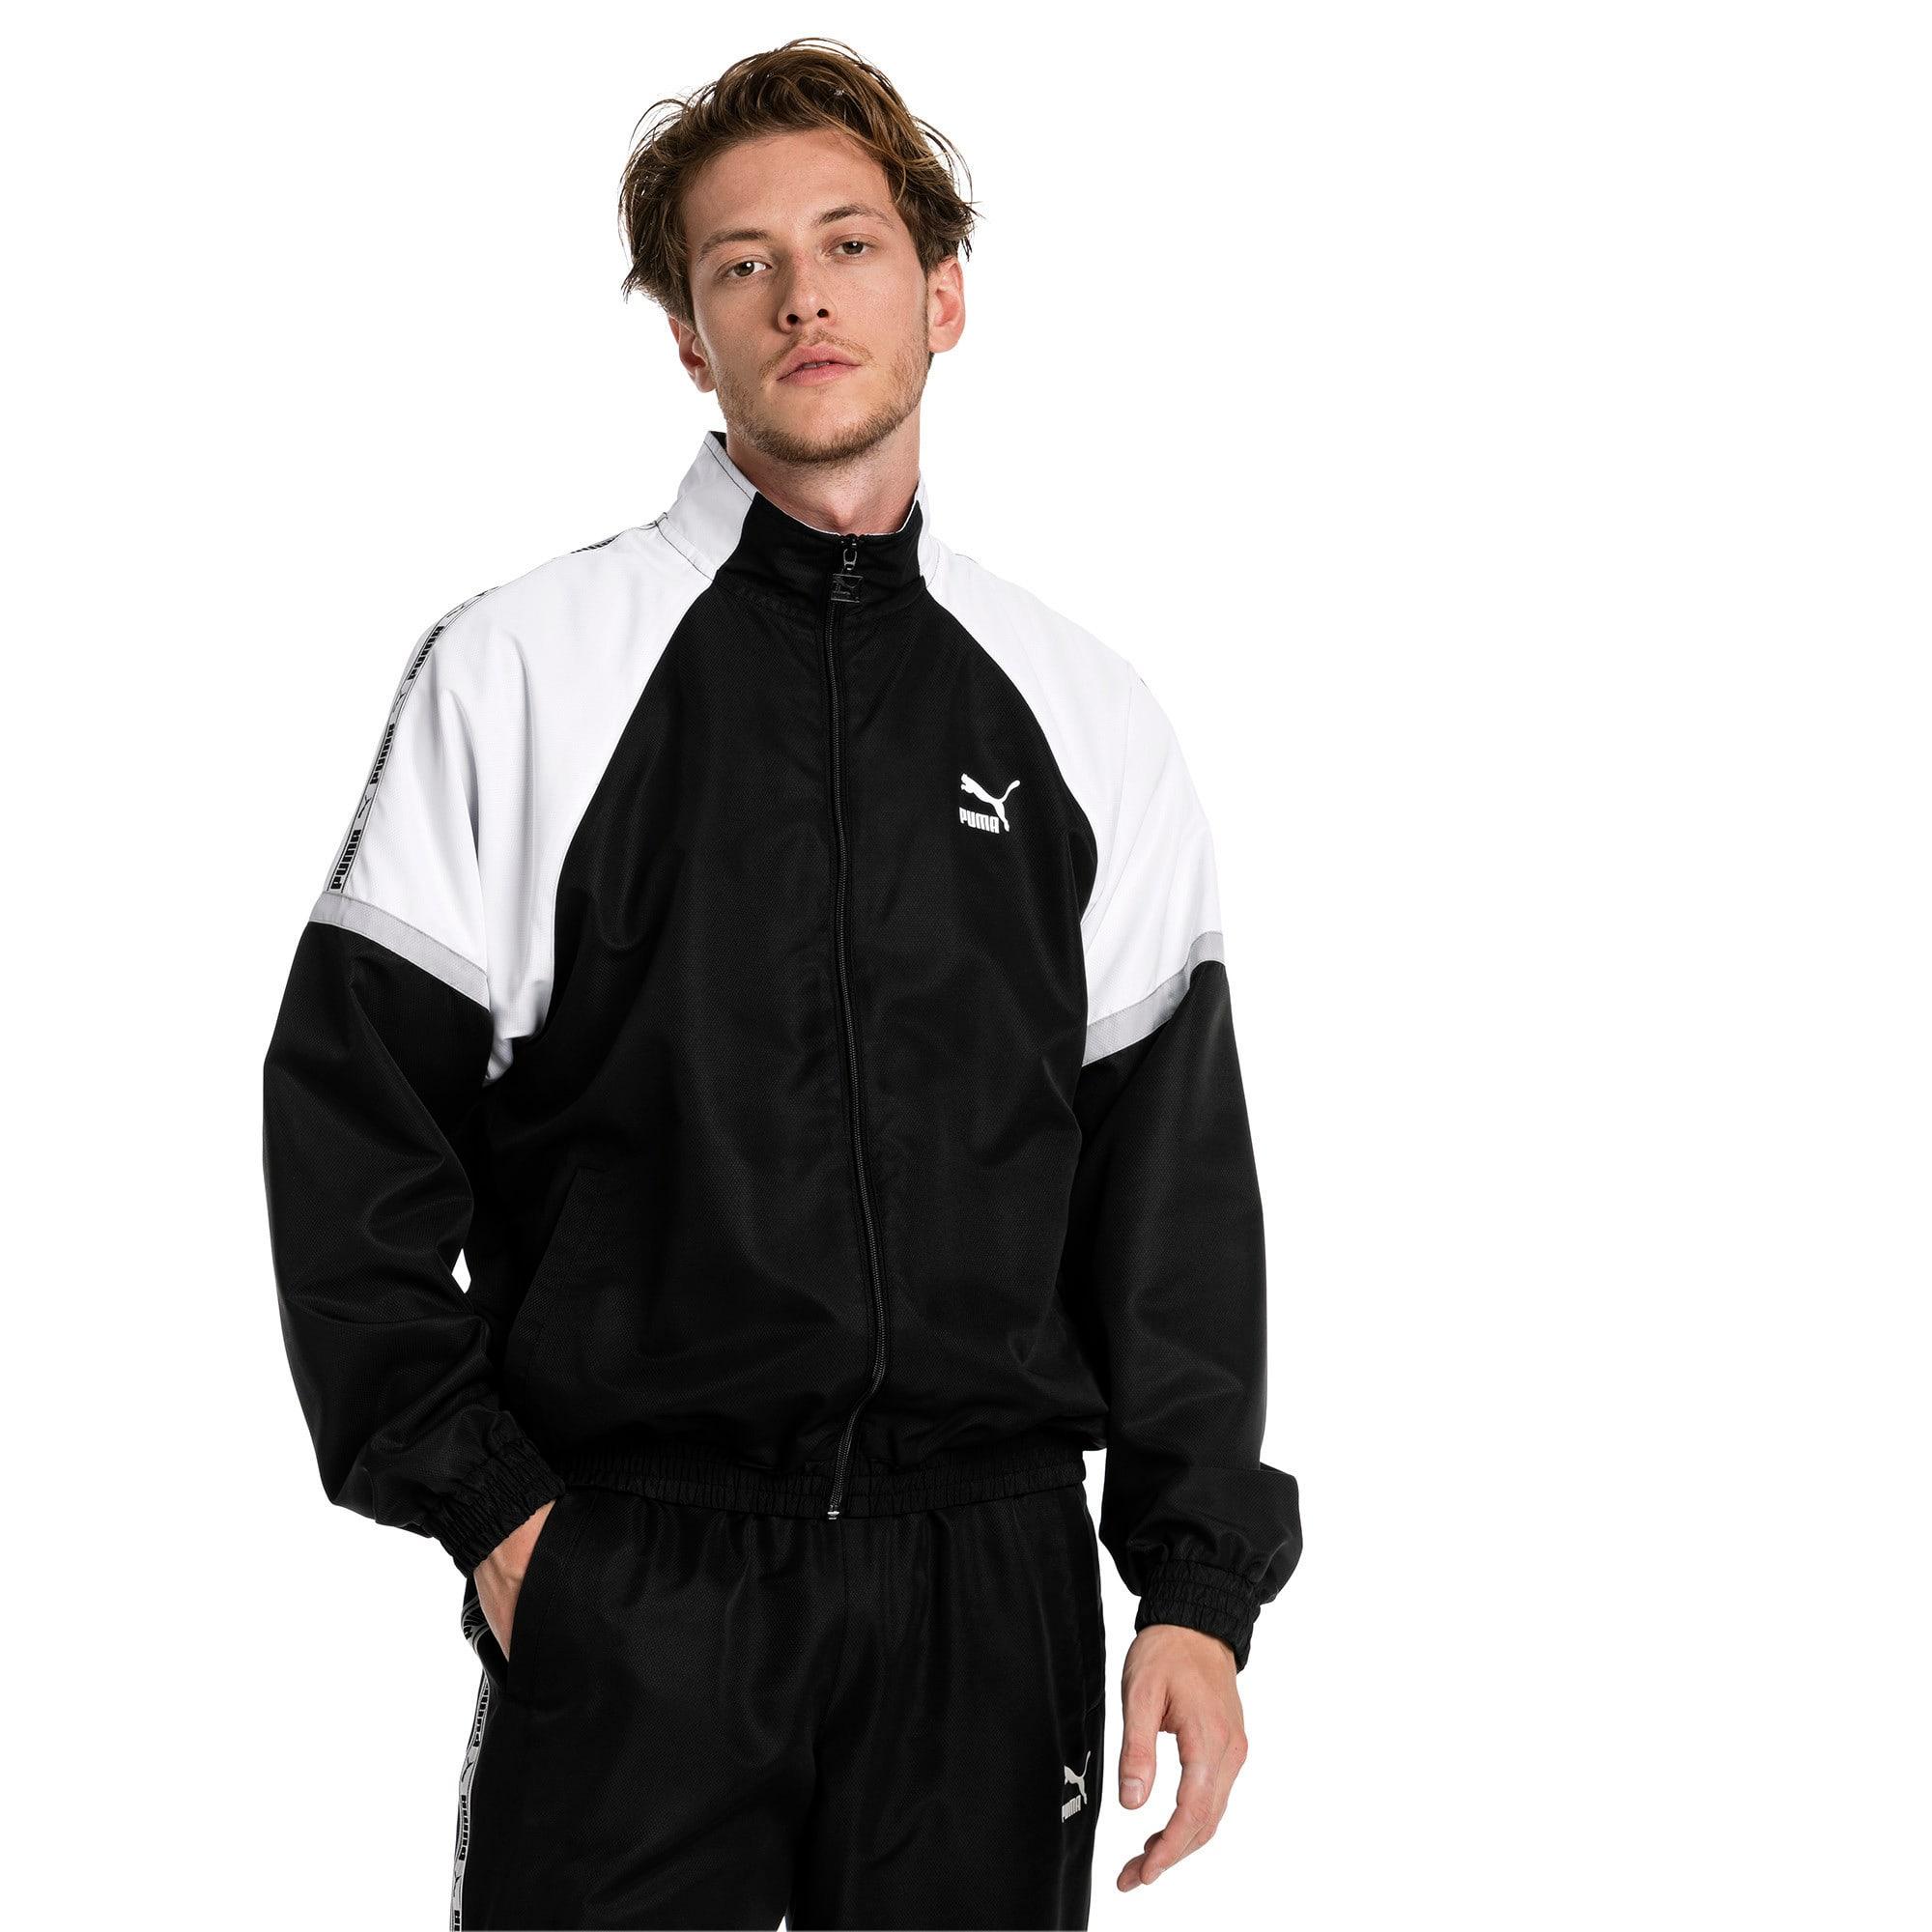 Thumbnail 1 of PUMA XTG Full Zip Men's Woven Jacket, Puma Black-Puma white, medium